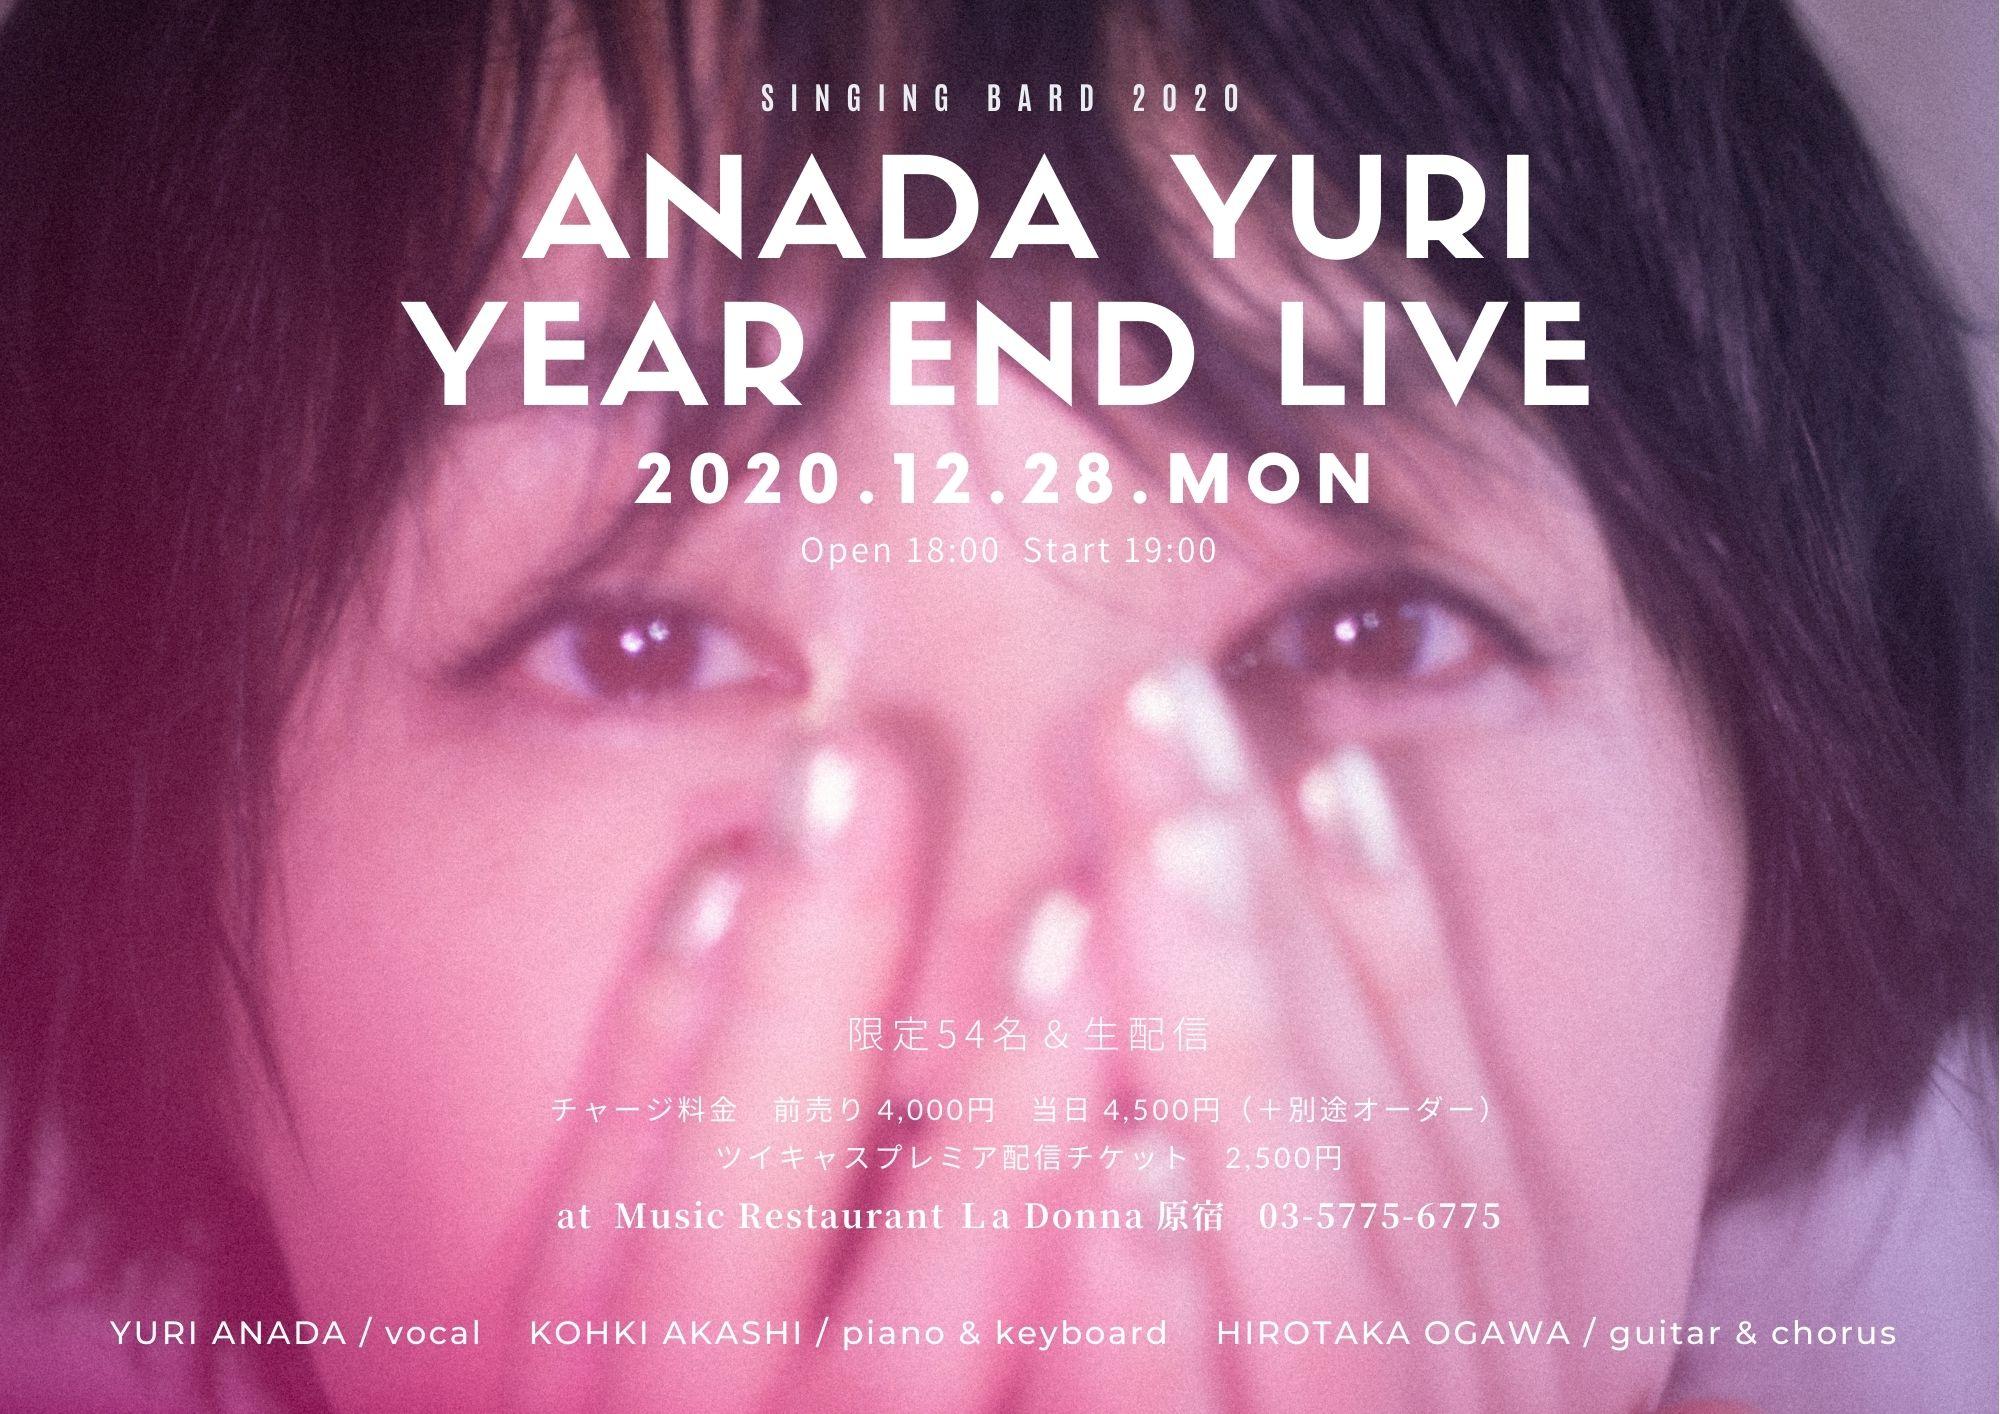 SINGING BARD 2020 ANADA YURI YEAR END LIVE